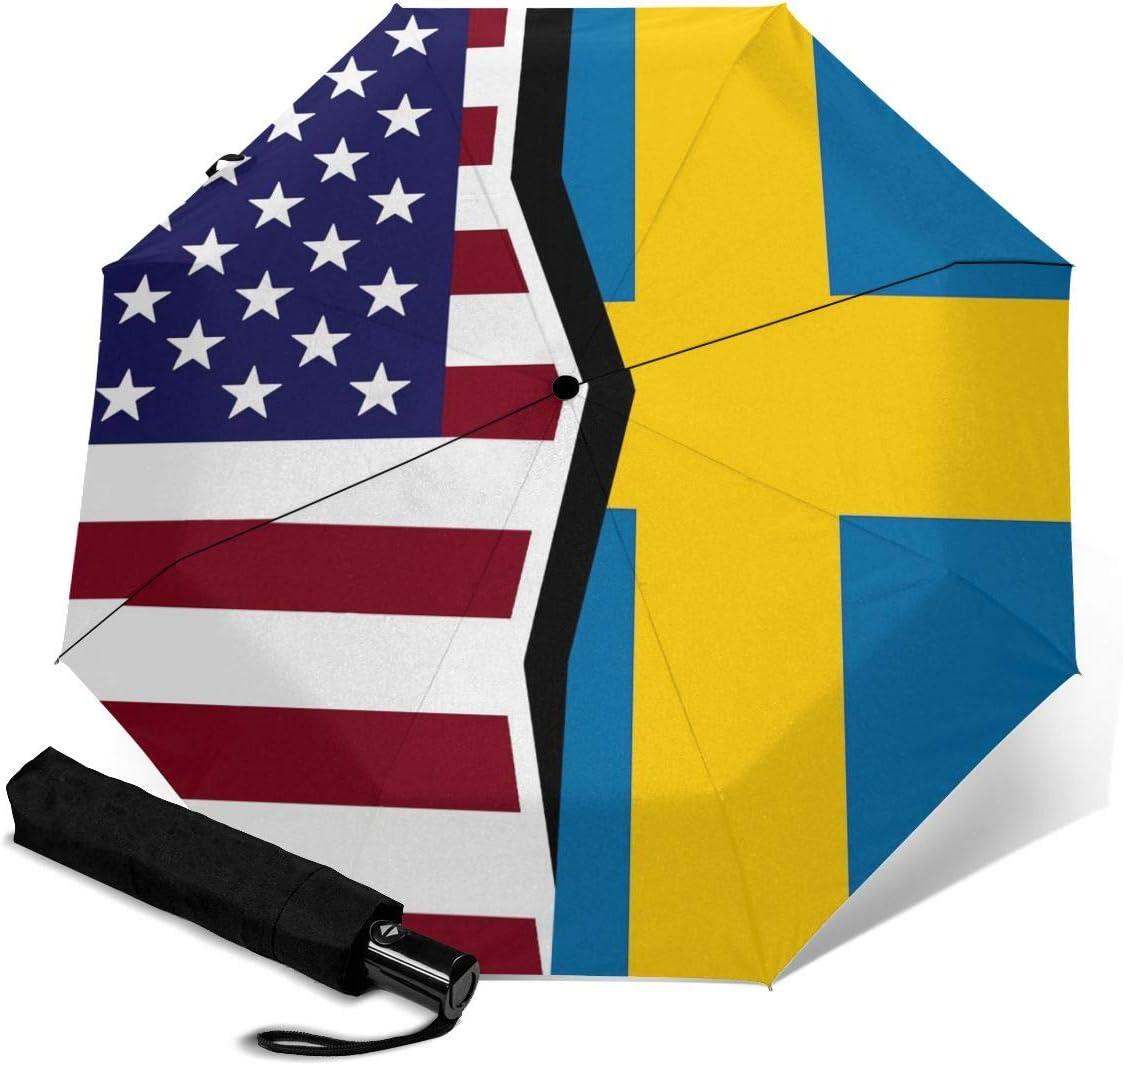 United States And Sweden Flag Automatic Folding Umbrella Super Sunscreen Rain Portable Creative UV Protection Tri-Fold Umbrella